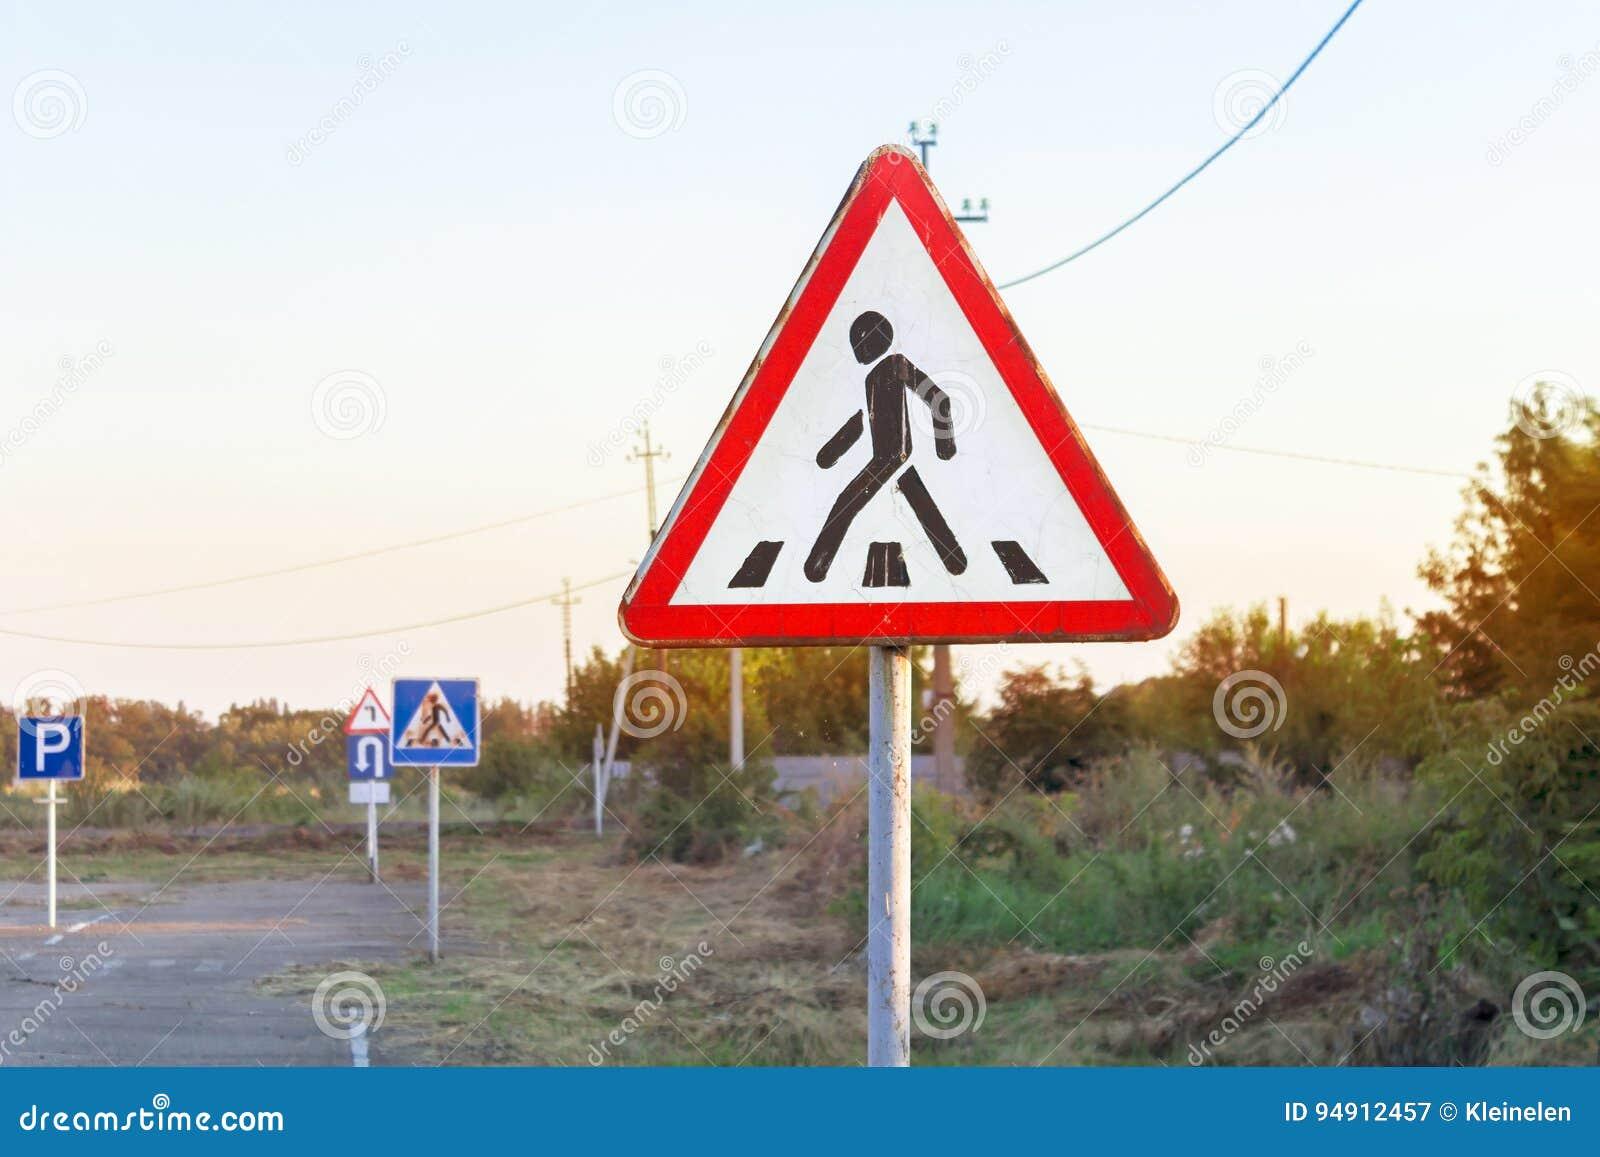 Pedestrian crossing alert traffic sign, various road signs, driving school training ground